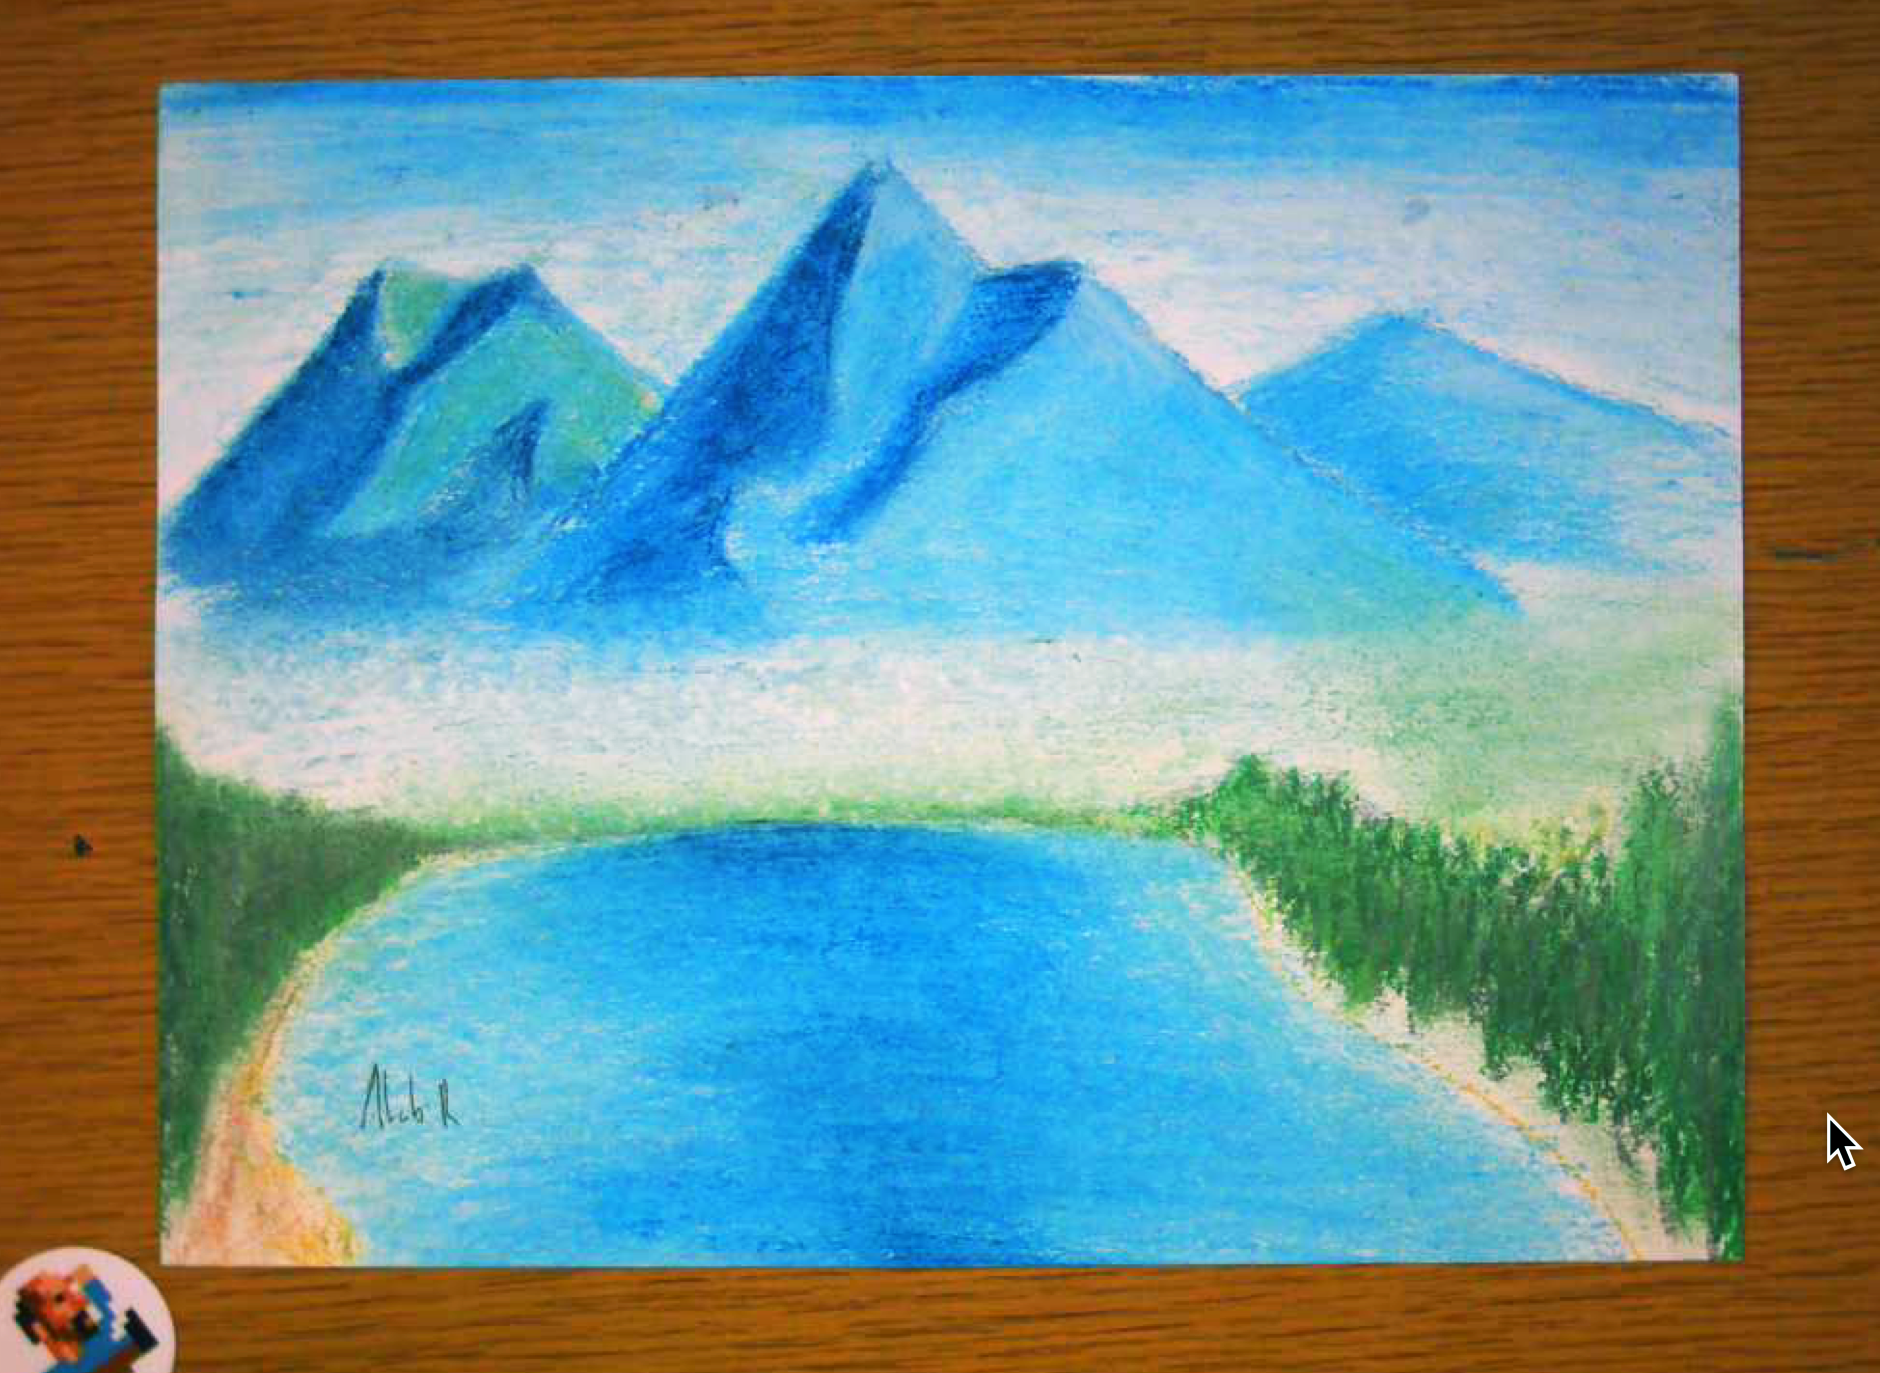 Landscape_Pastel_AhabR